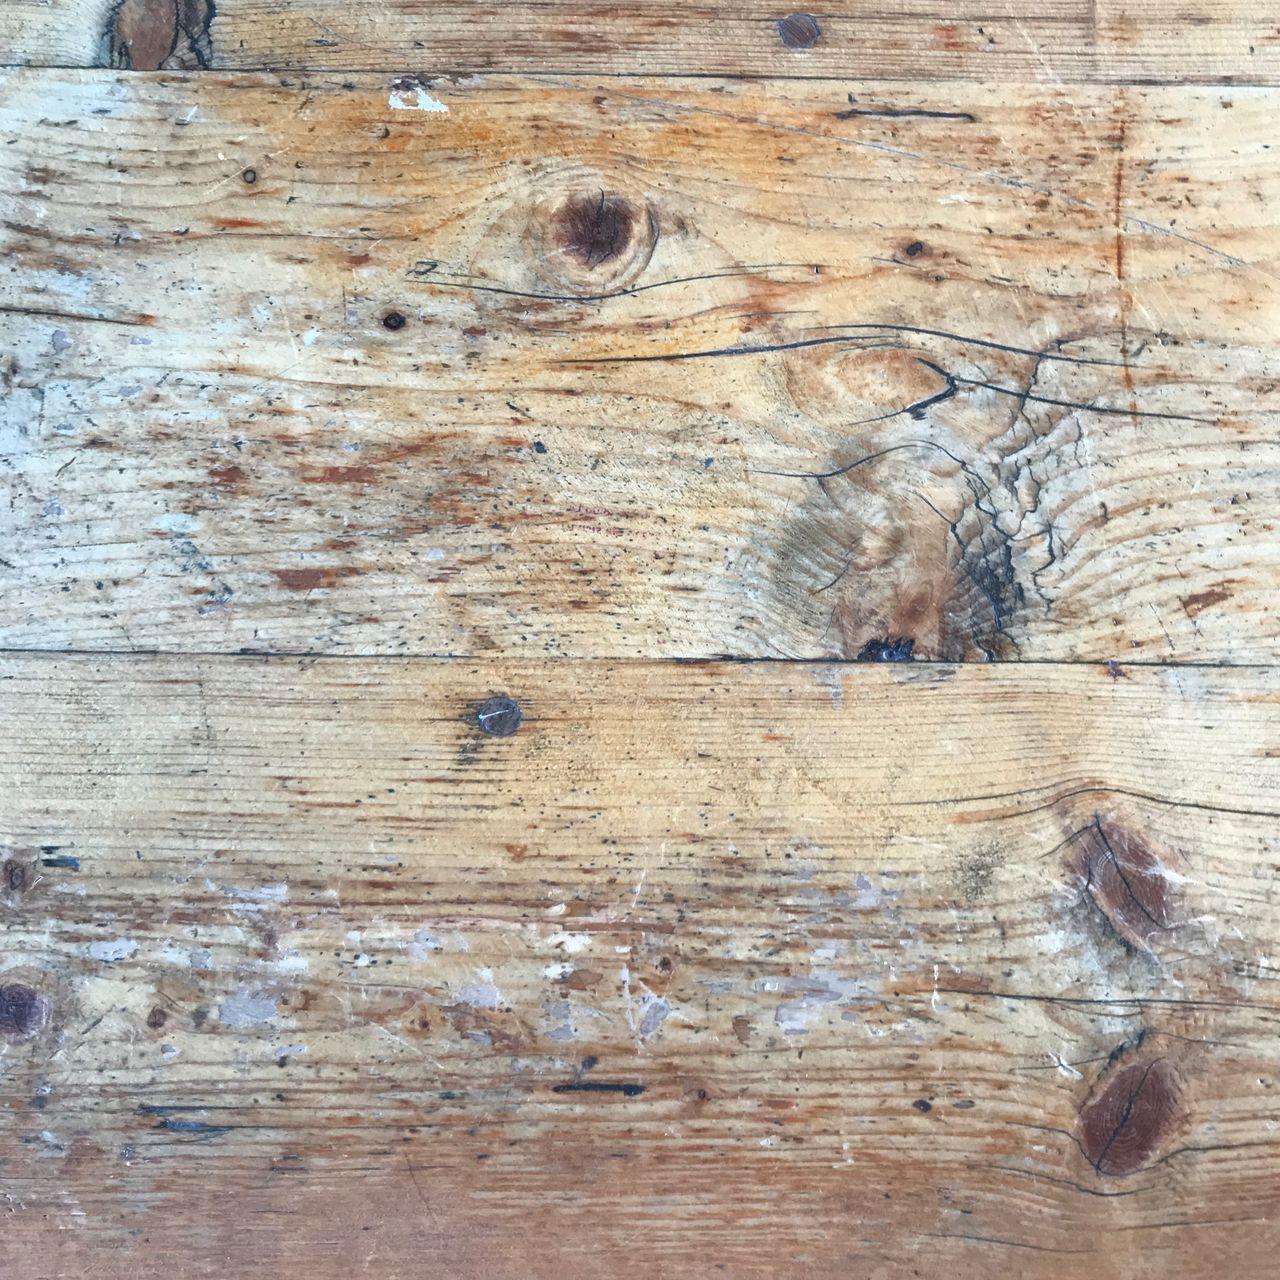 FULL FRAME SHOT OF OLD WOODEN TABLE